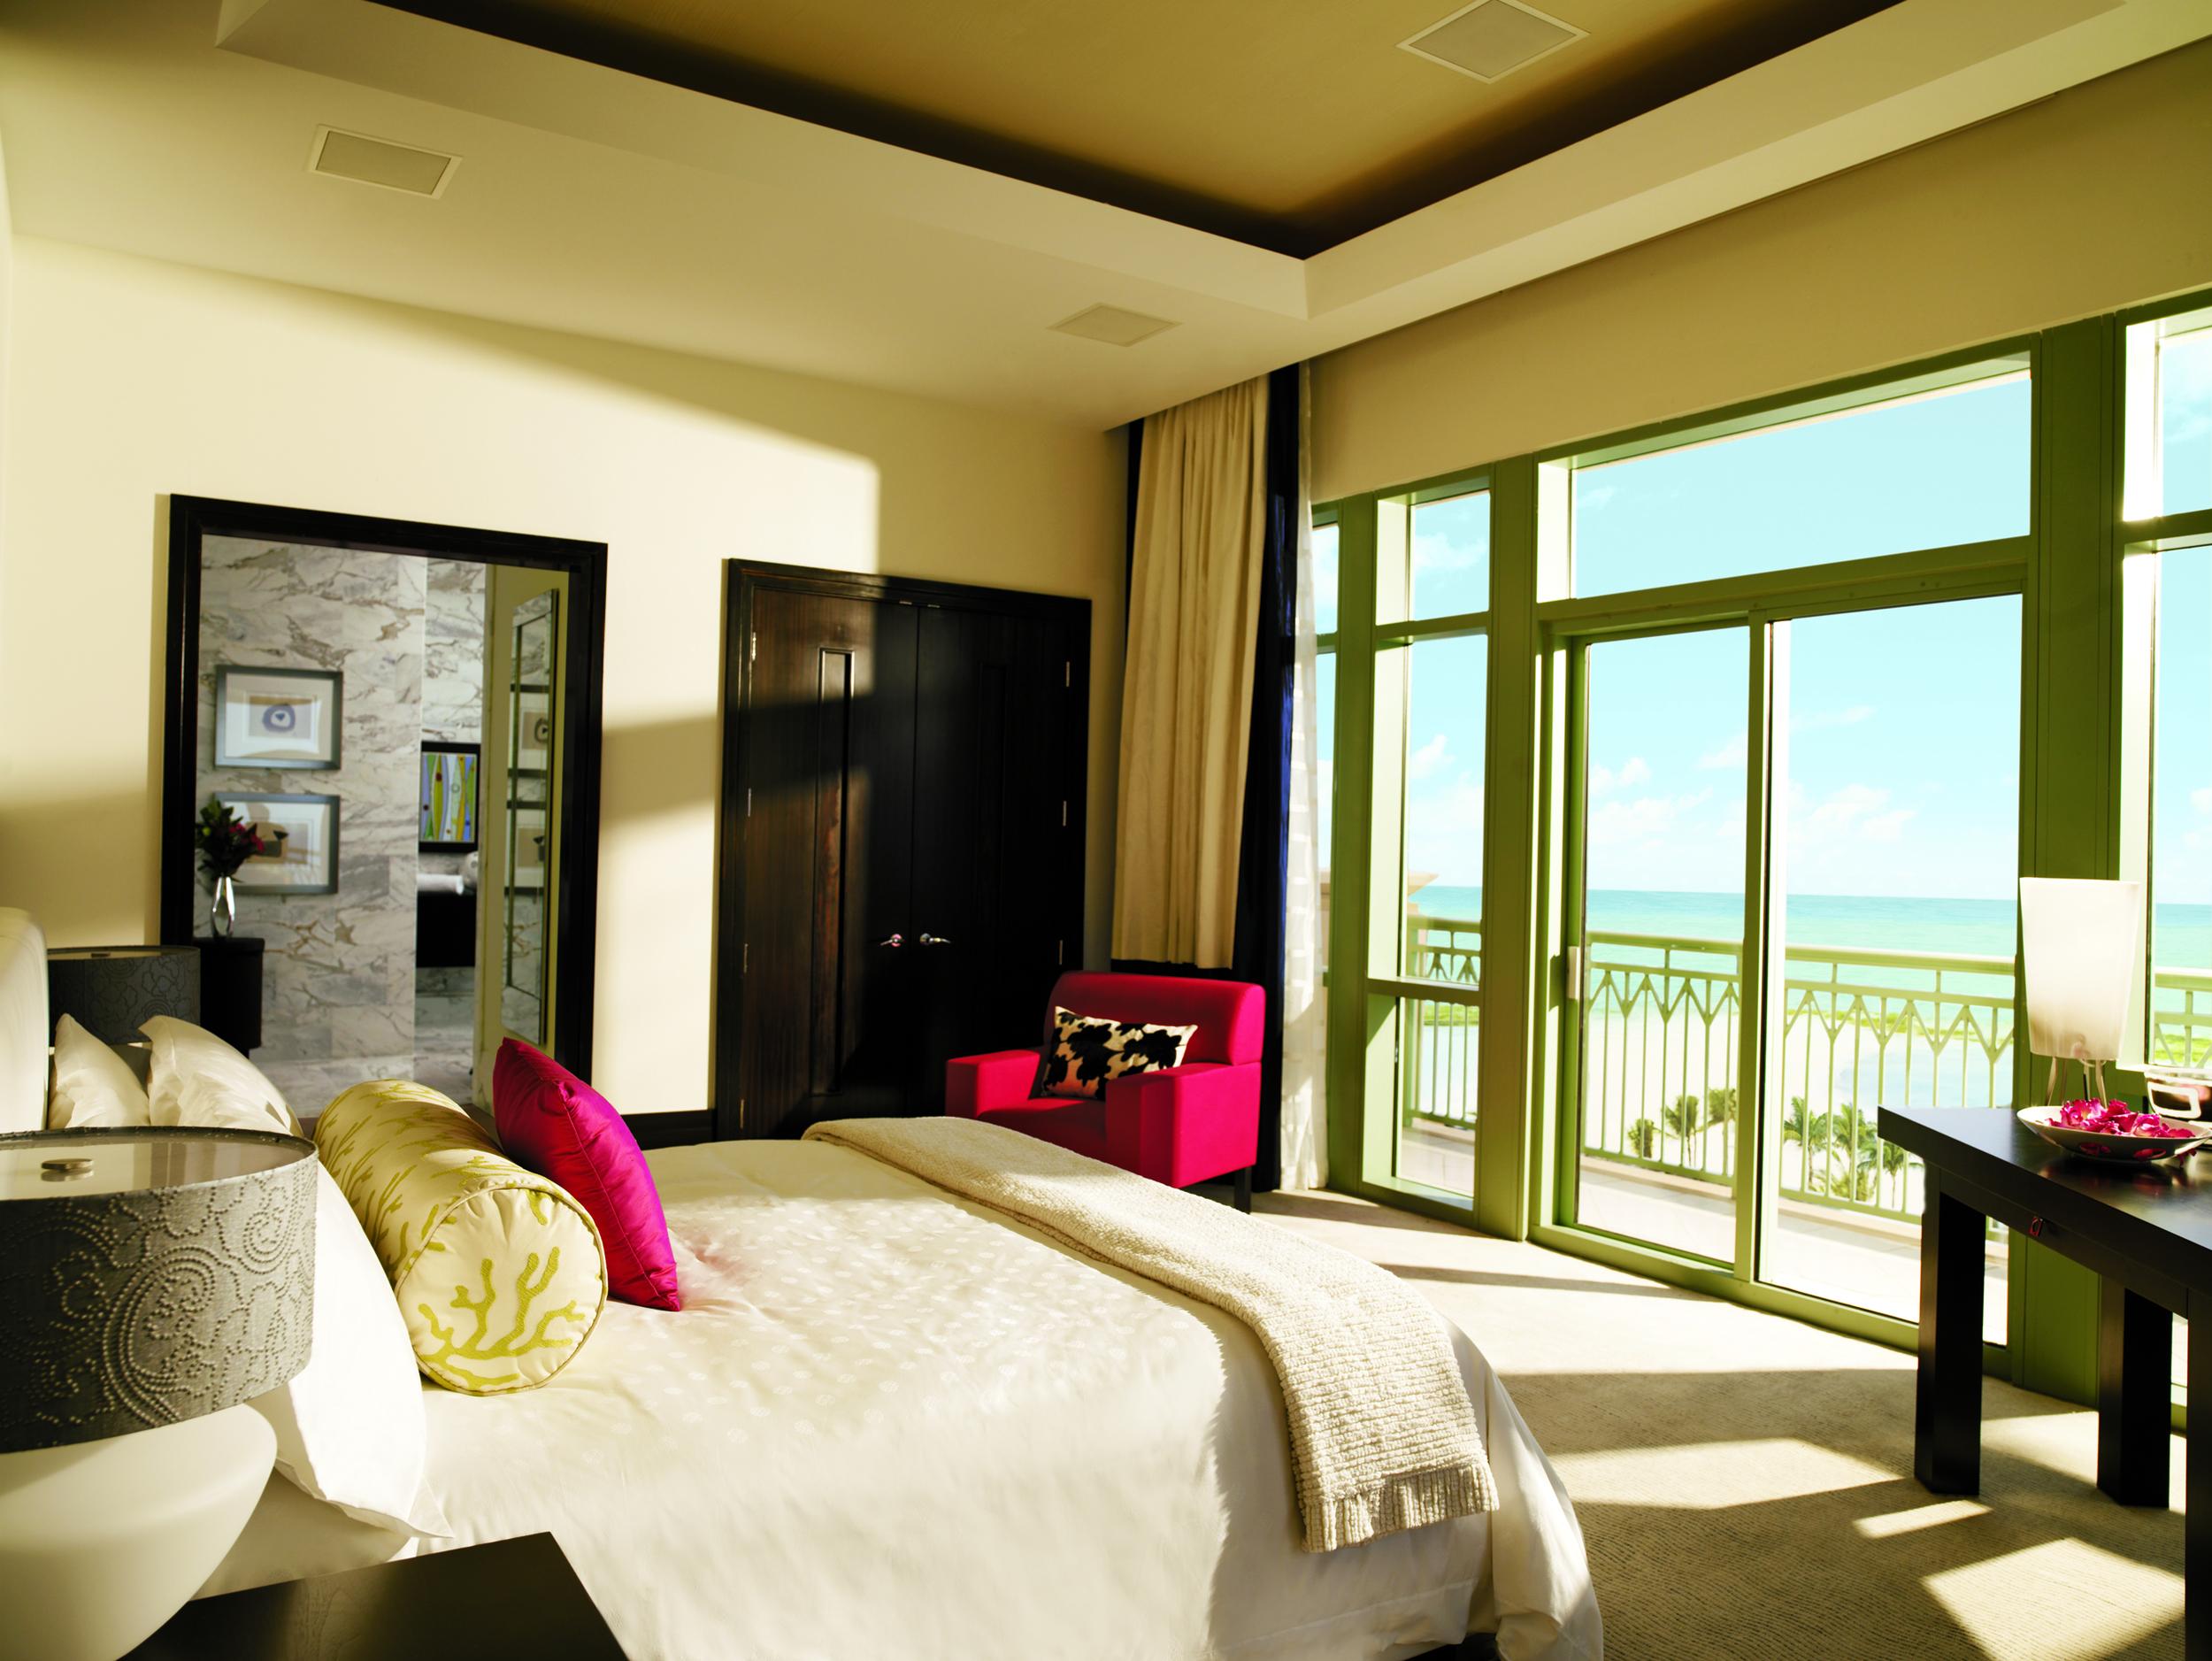 Penthouse_Suite_Bedroom_1237_standard.jpg